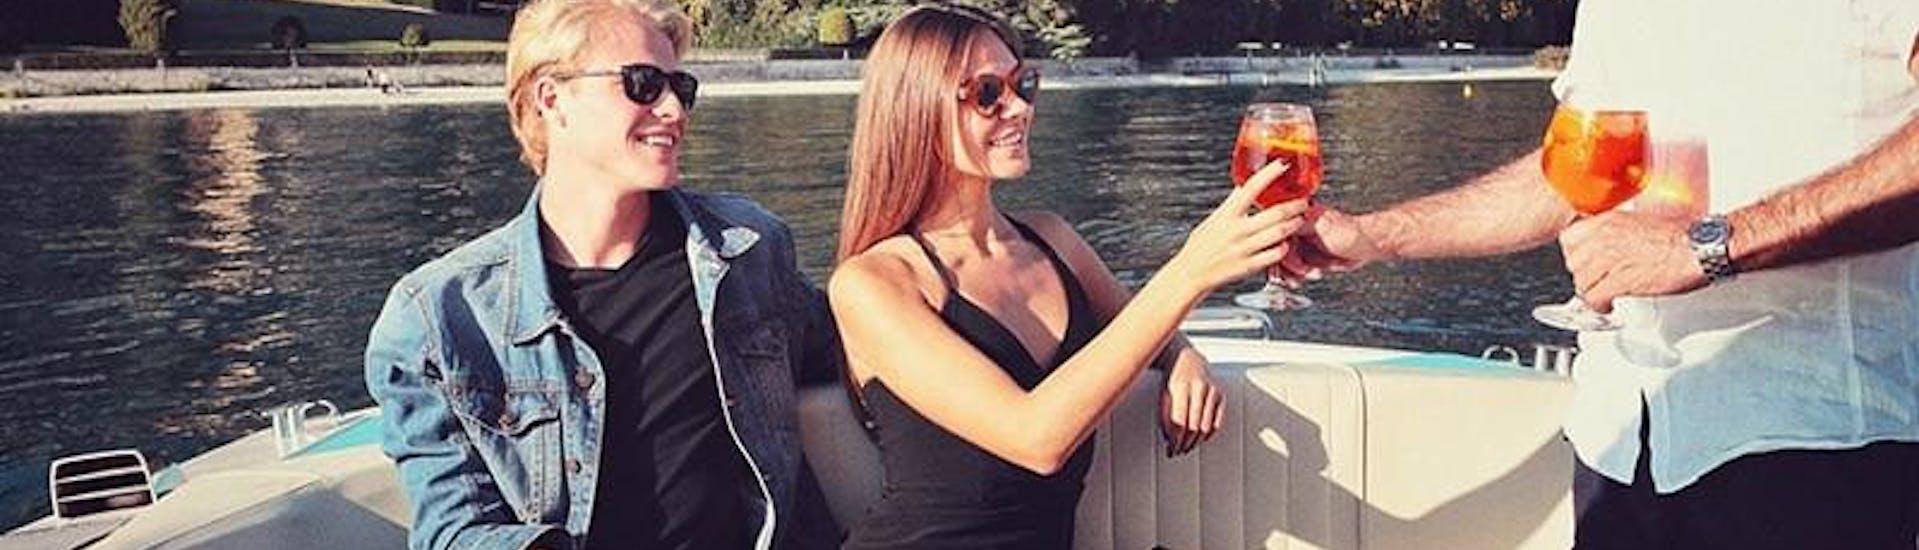 Private Boat Trip around Sirmione at Sunset with Aperitif with Bertoldi Boats Lago di Garda - Hero image